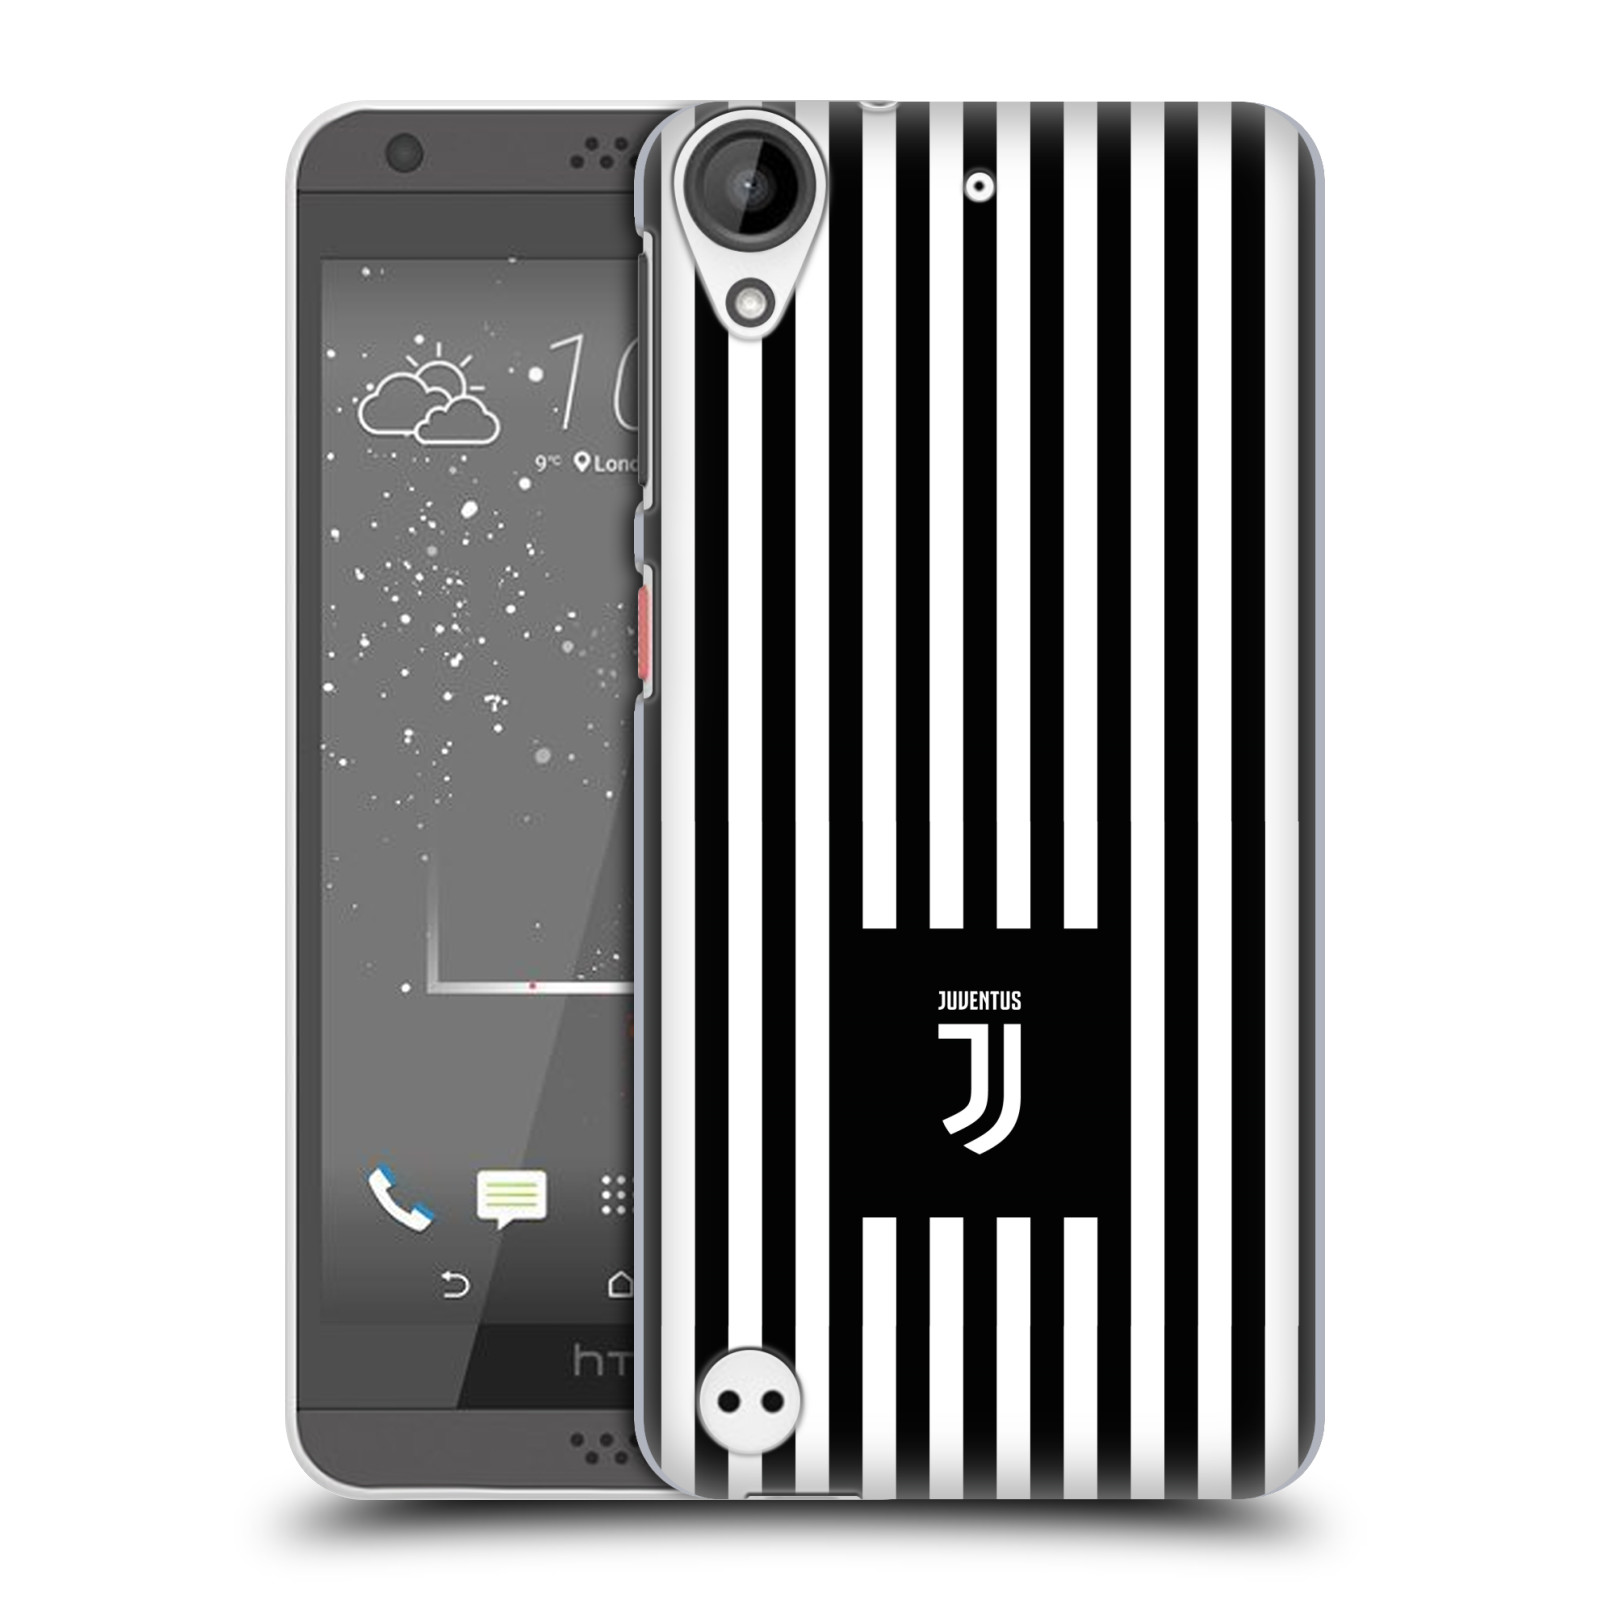 Plastové pouzdro na mobil HTC Desire 530 - Head Case - Juventus FC - Nové logo - Pruhy